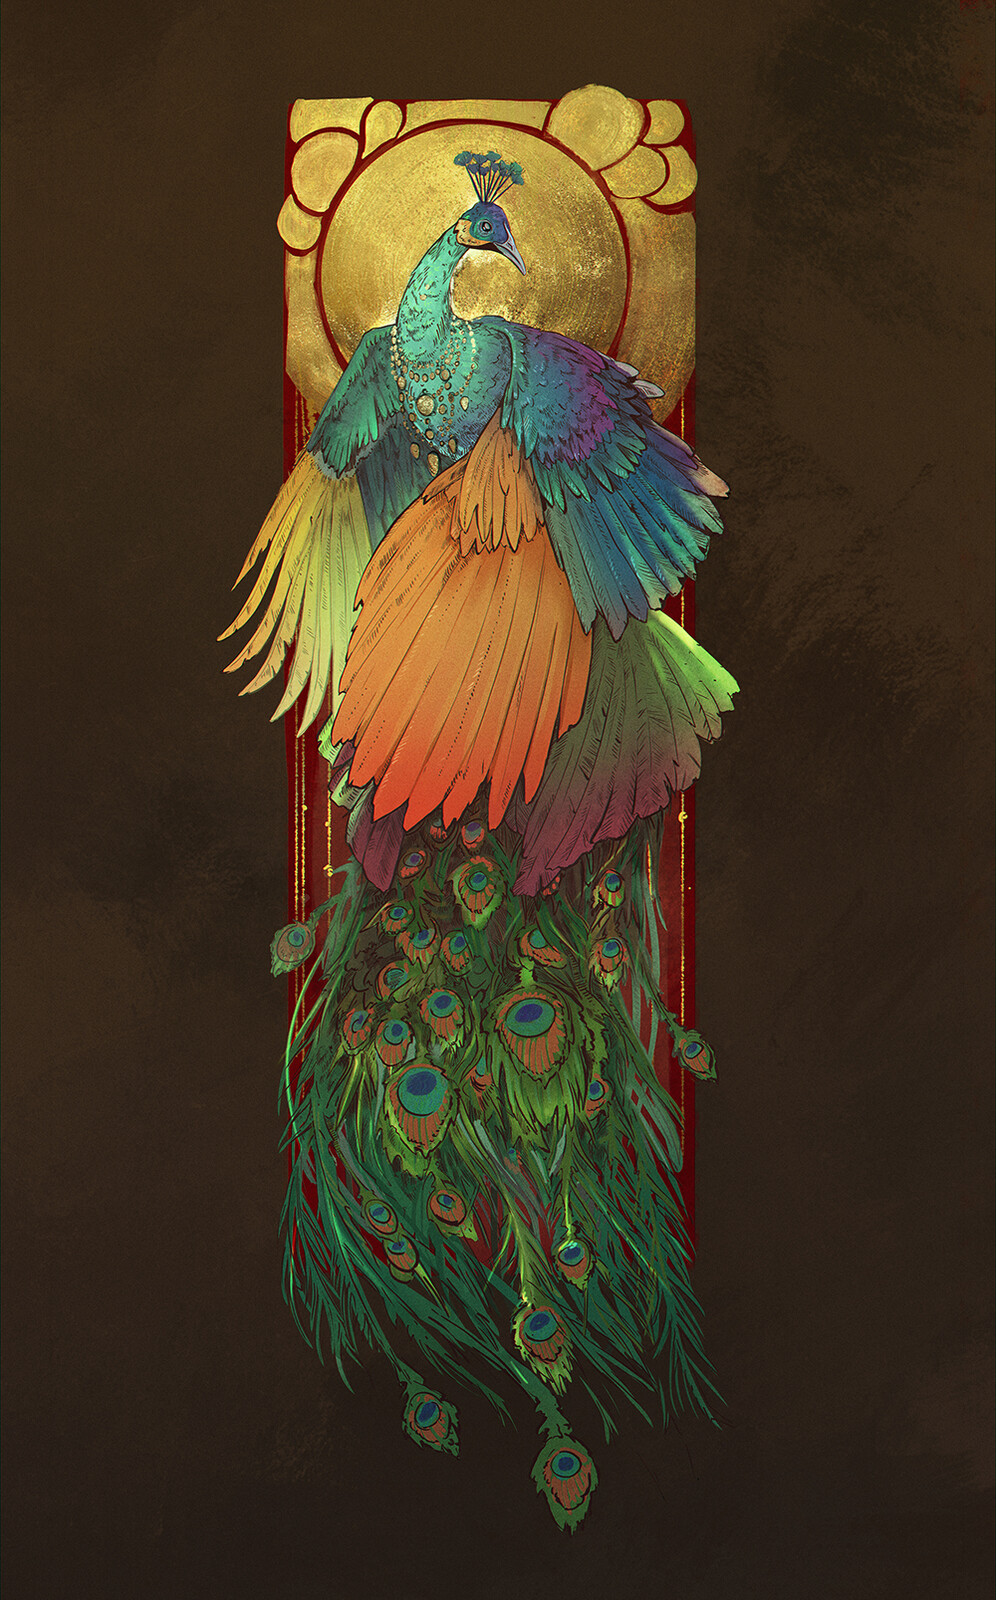 ملك طاووس - Malak Tawoos